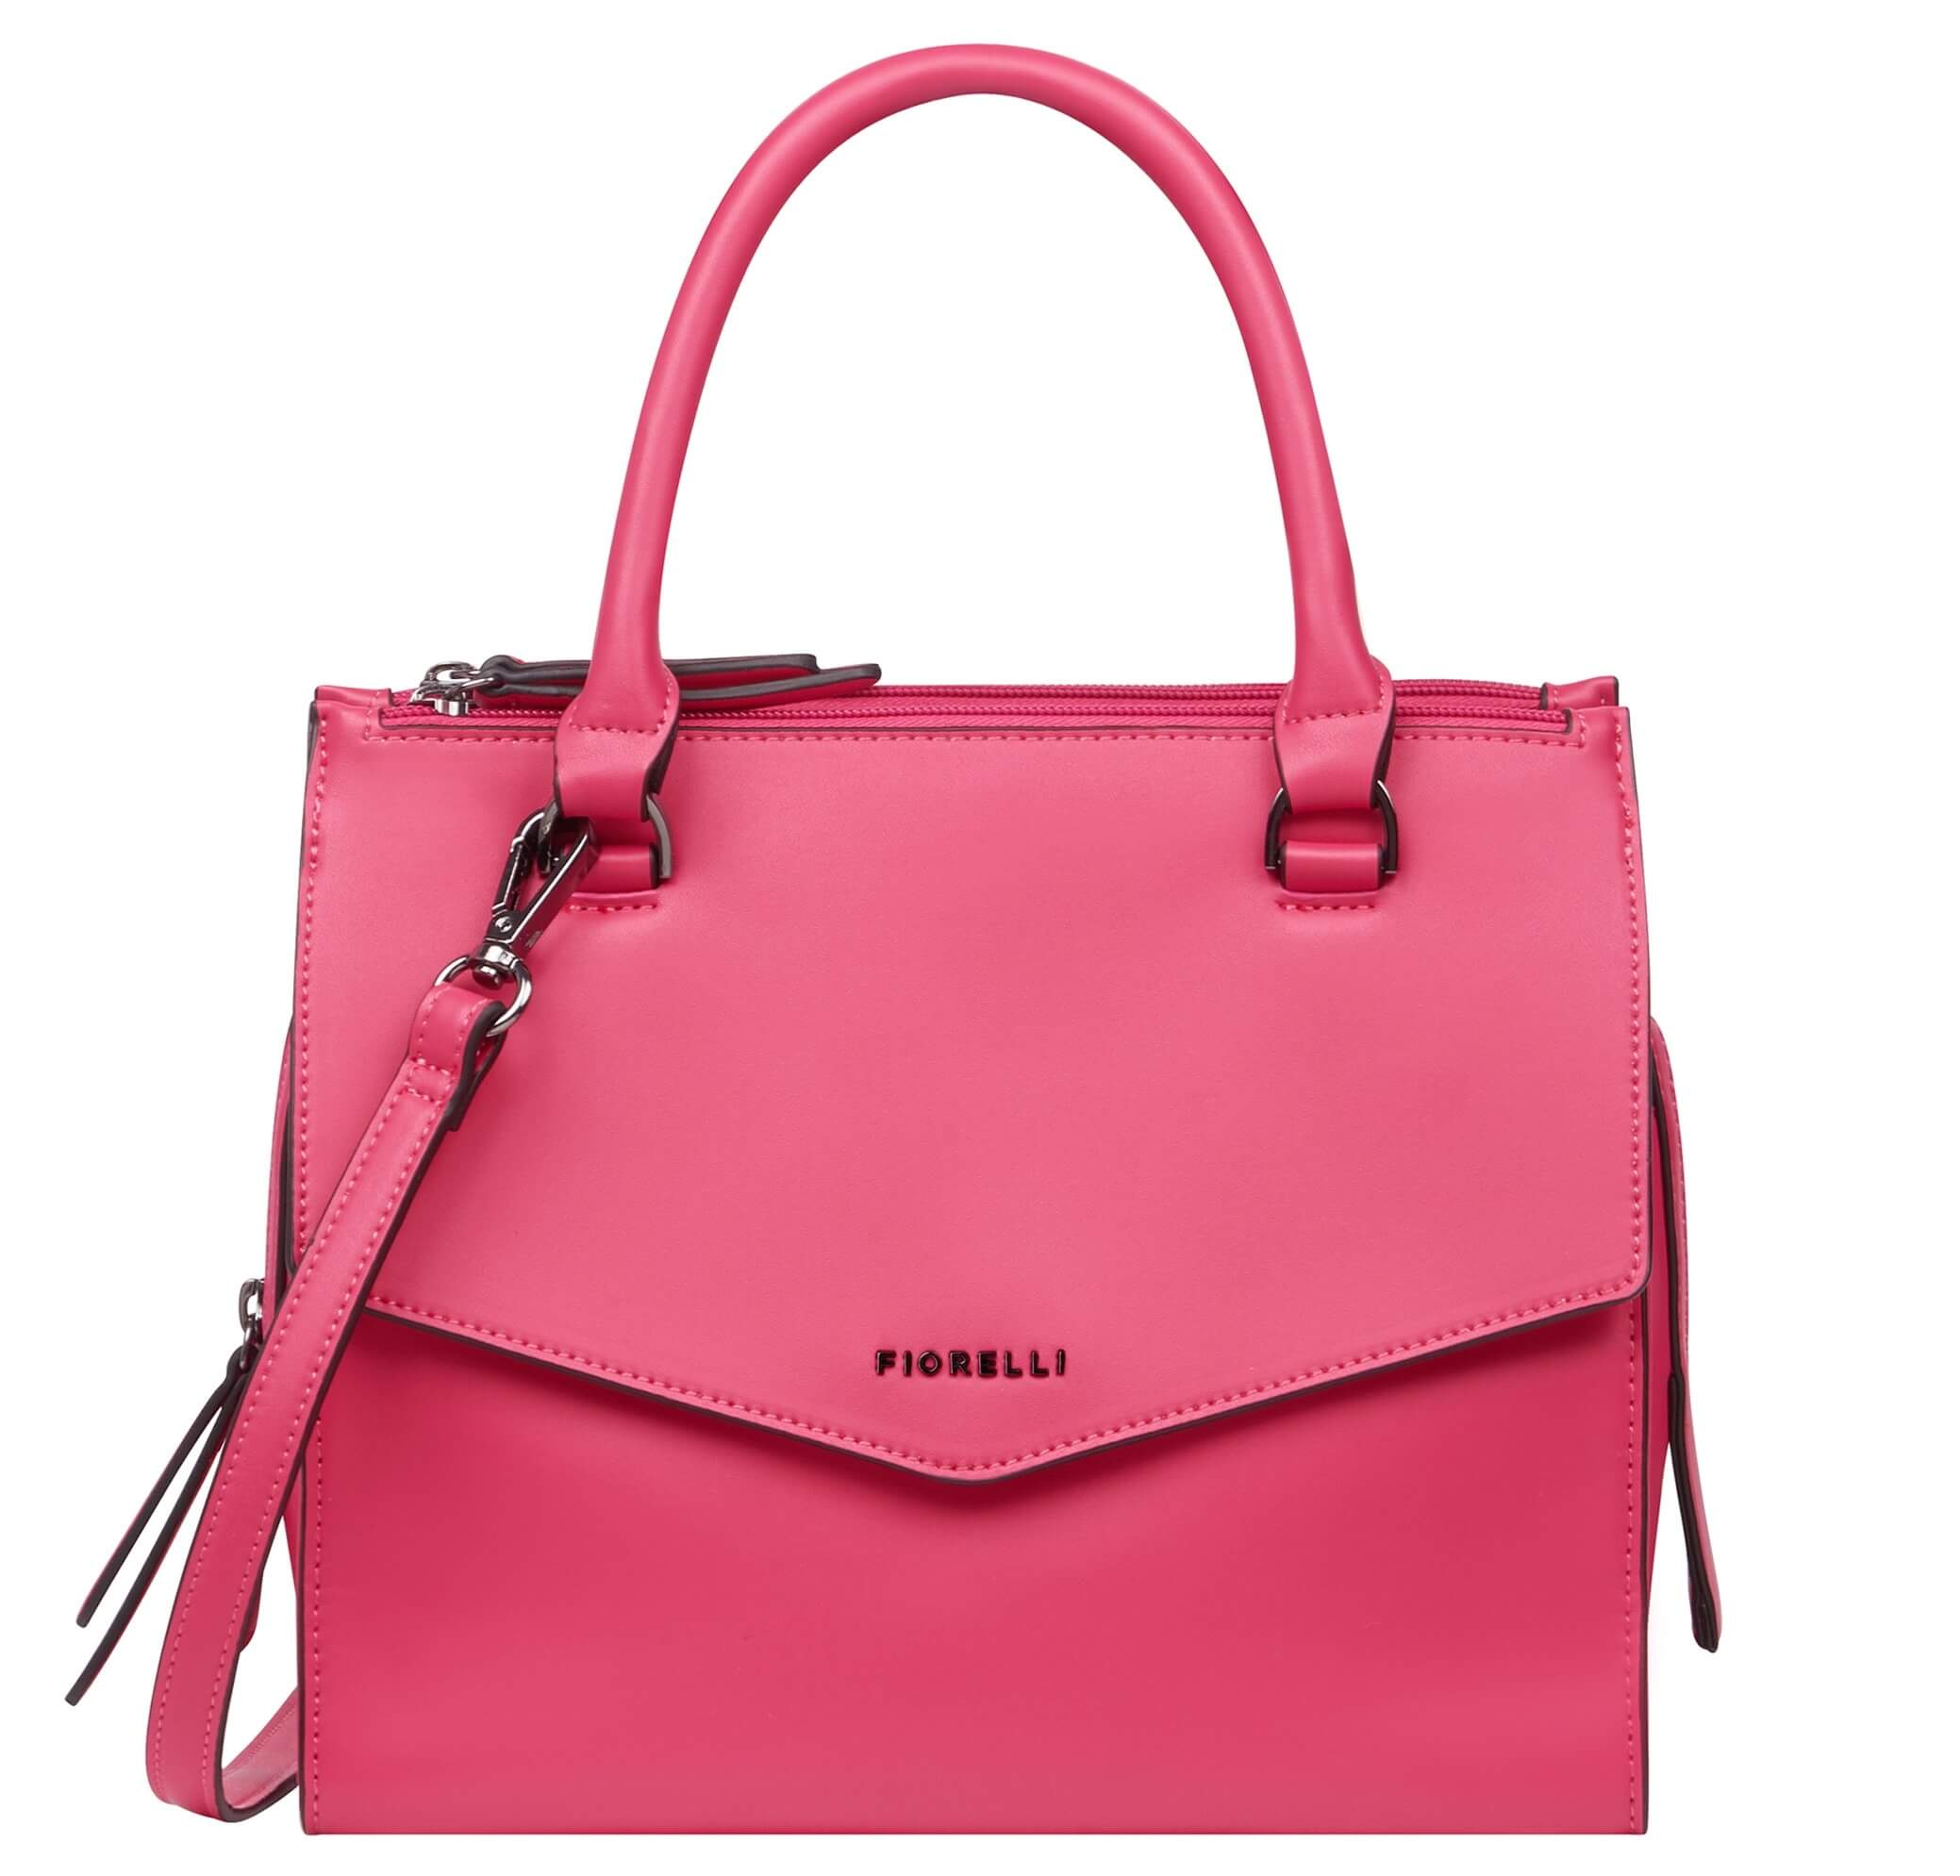 60958ea1c6 Fiorelli Elegantní kabelka Mia FWH0163 Raspberry Doprava ZDARMA ...